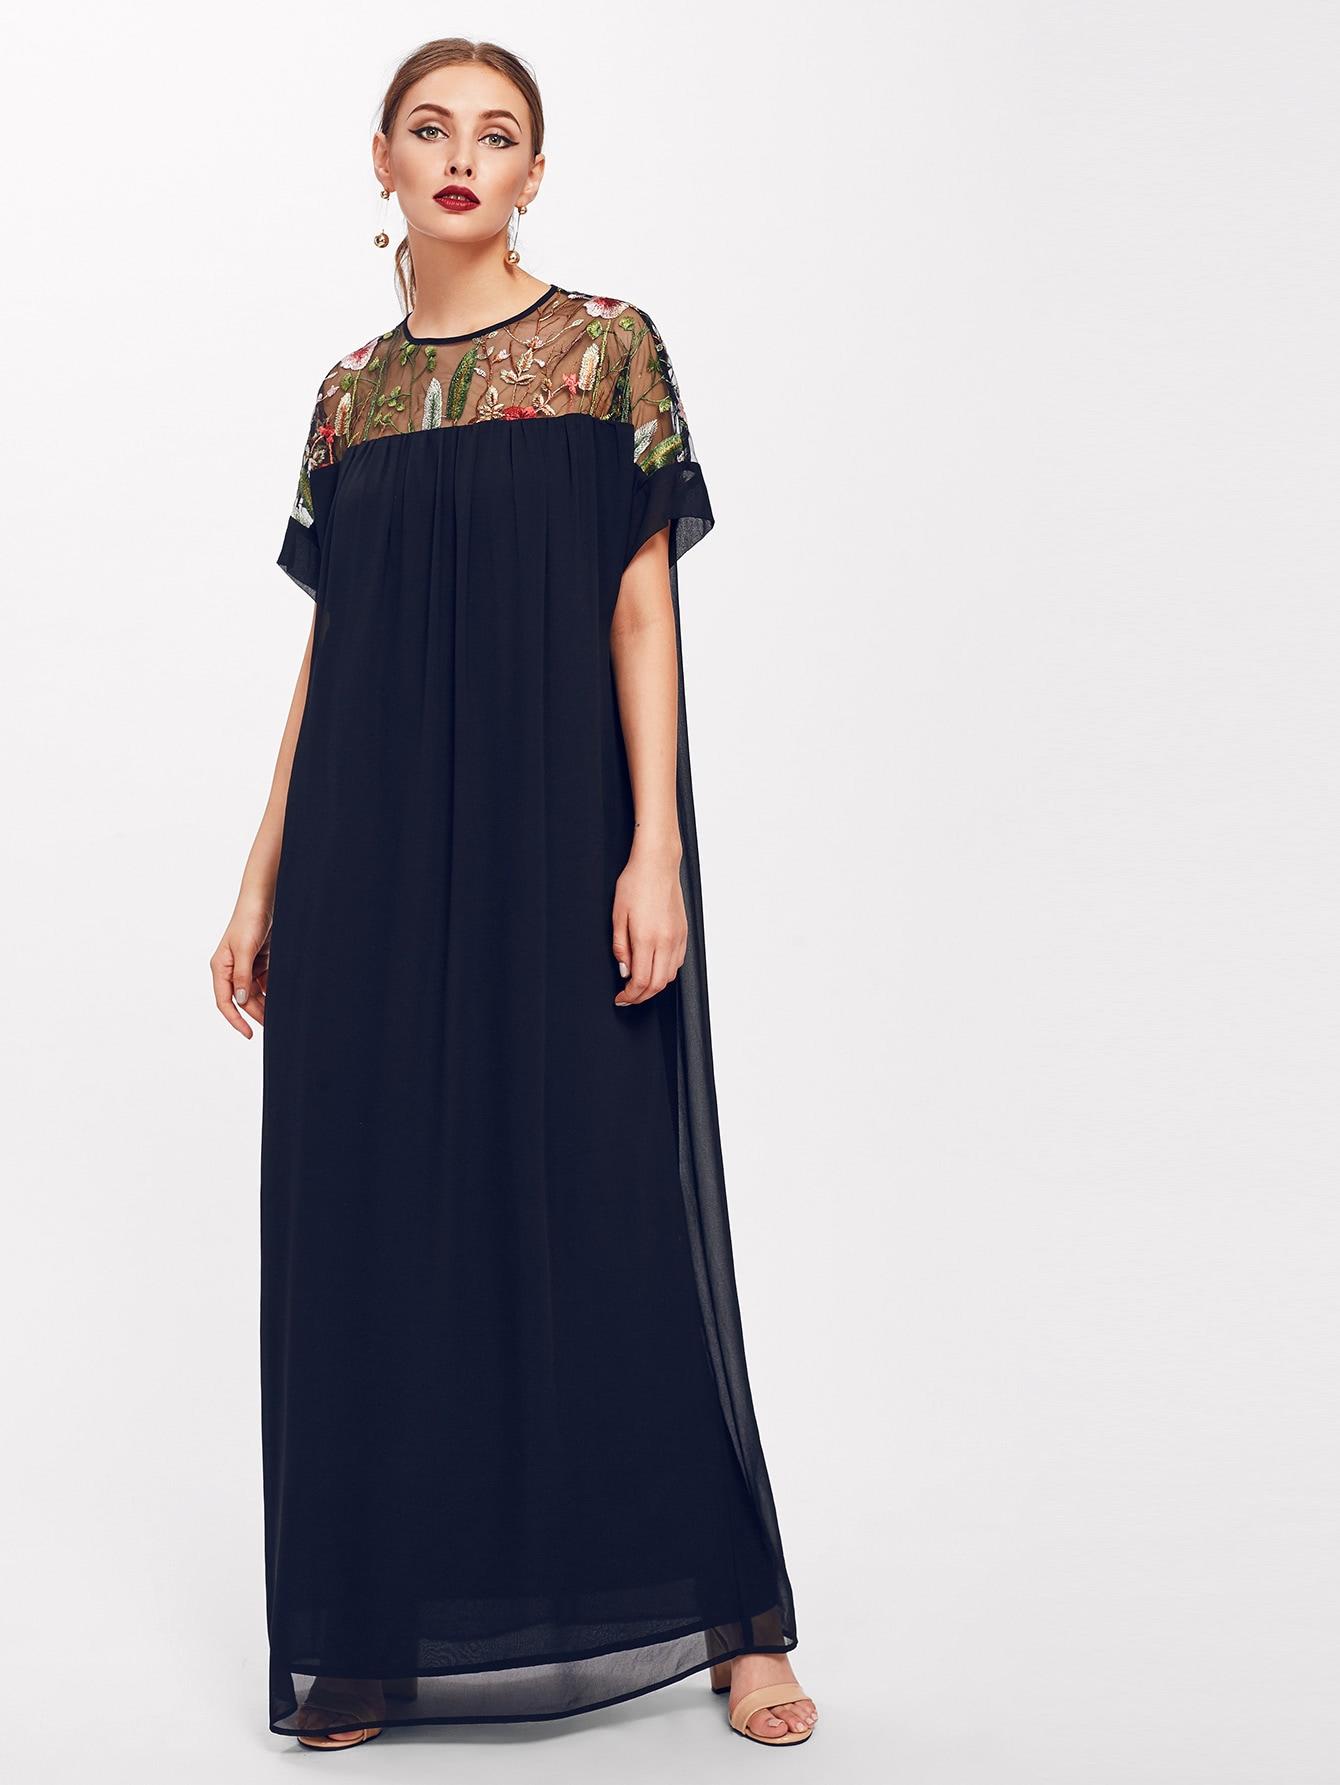 Keyhole Embroidered Mesh Yoke Dress embroidered mesh yoke heather knit tee